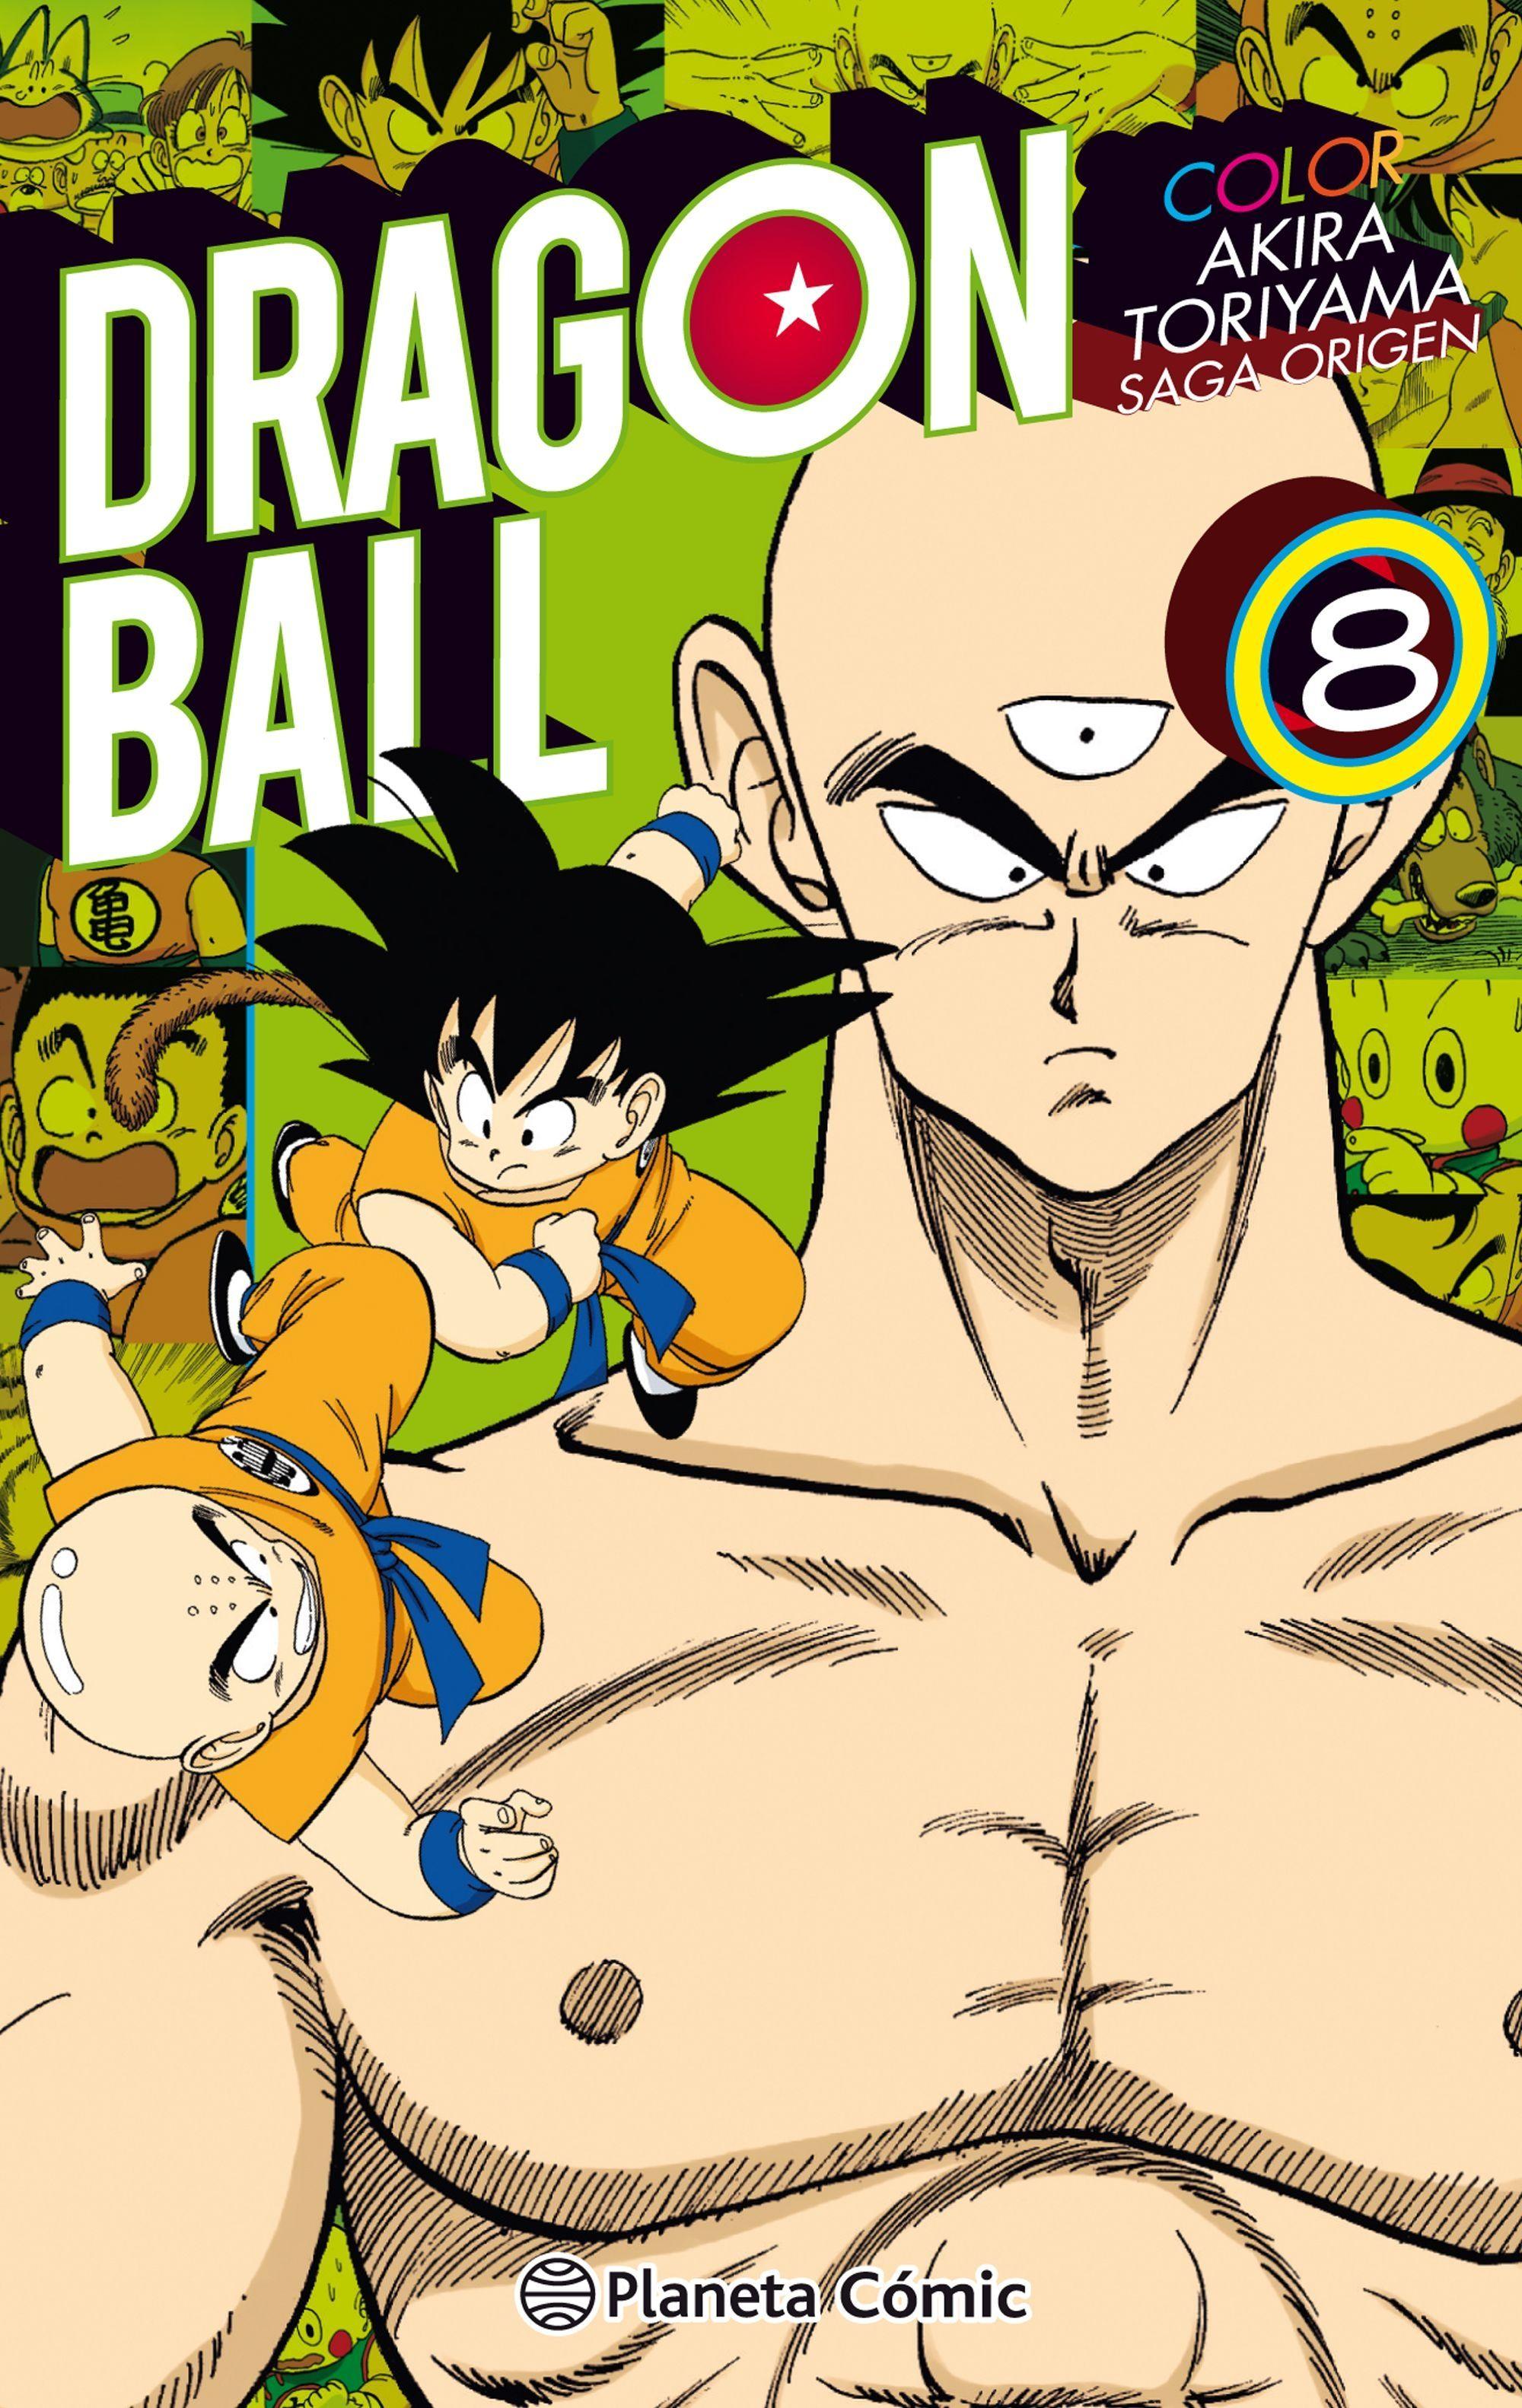 Dragon ball color | Manga | Pinterest | Traductor, Artes marciales y ...